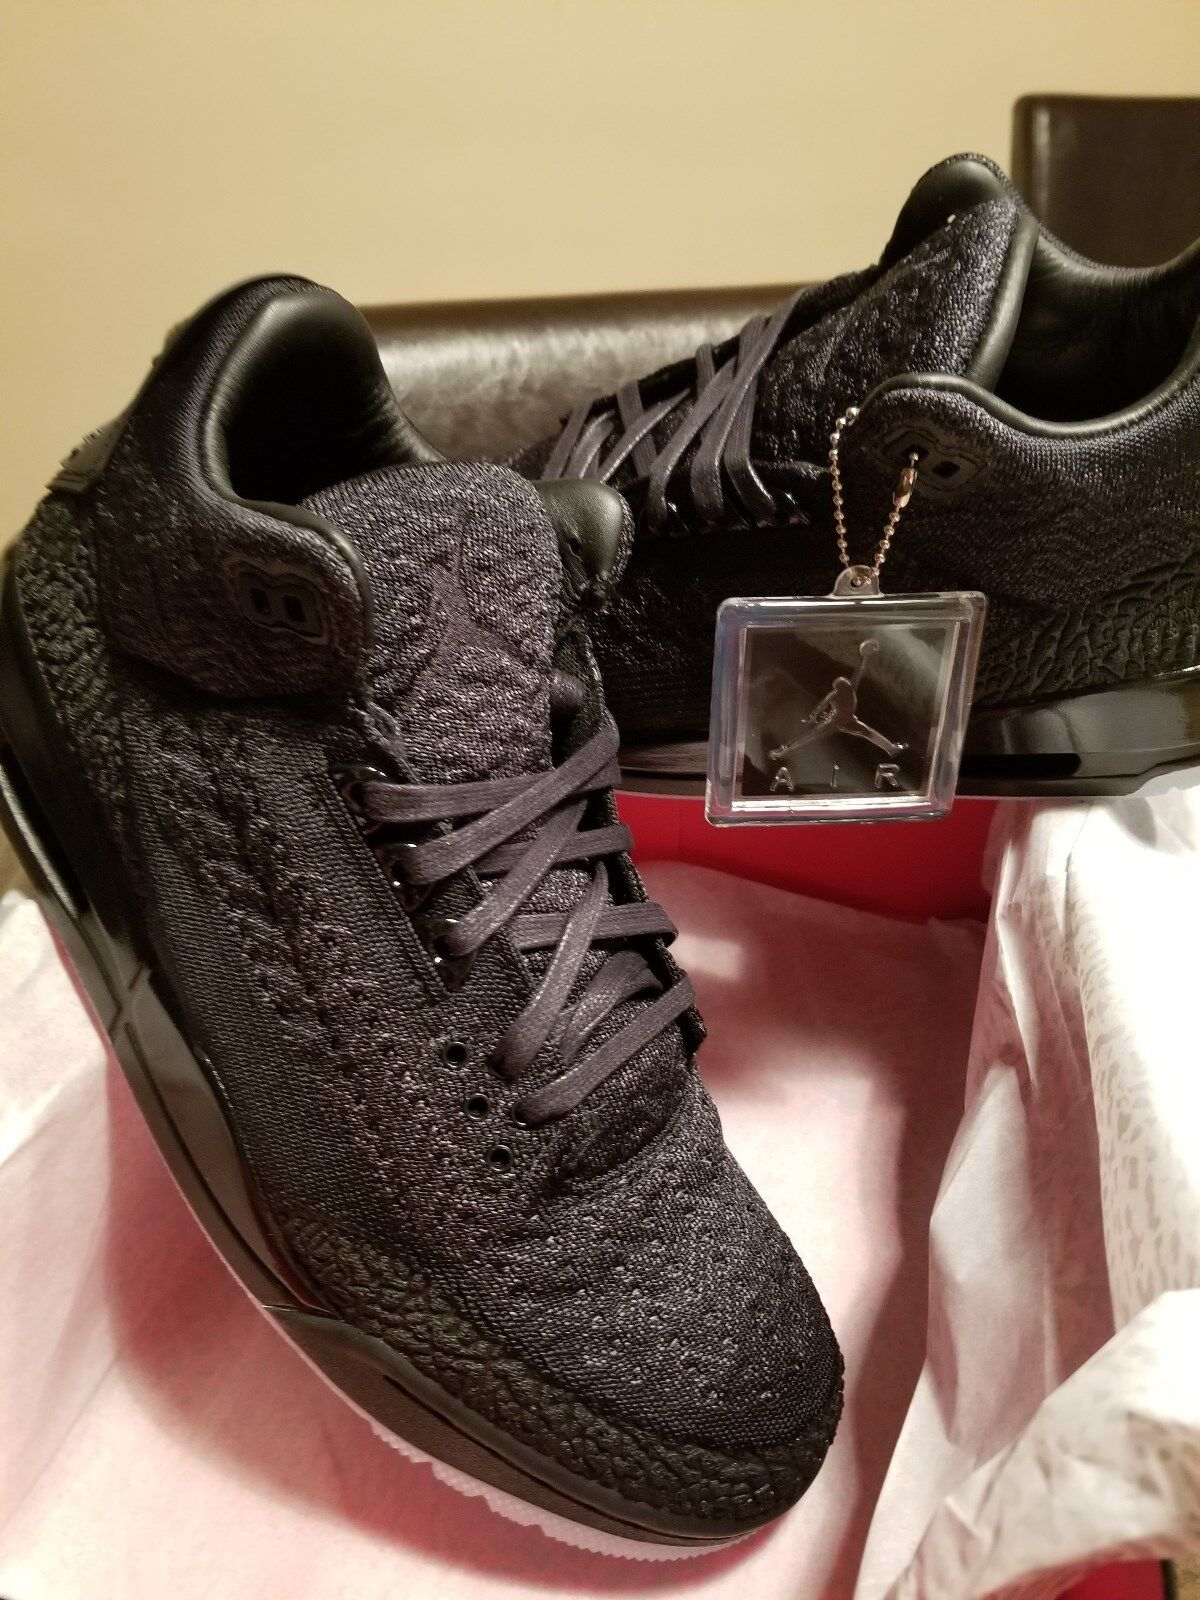 Nike Air Jordan3 III Retro Flyknit Size 11